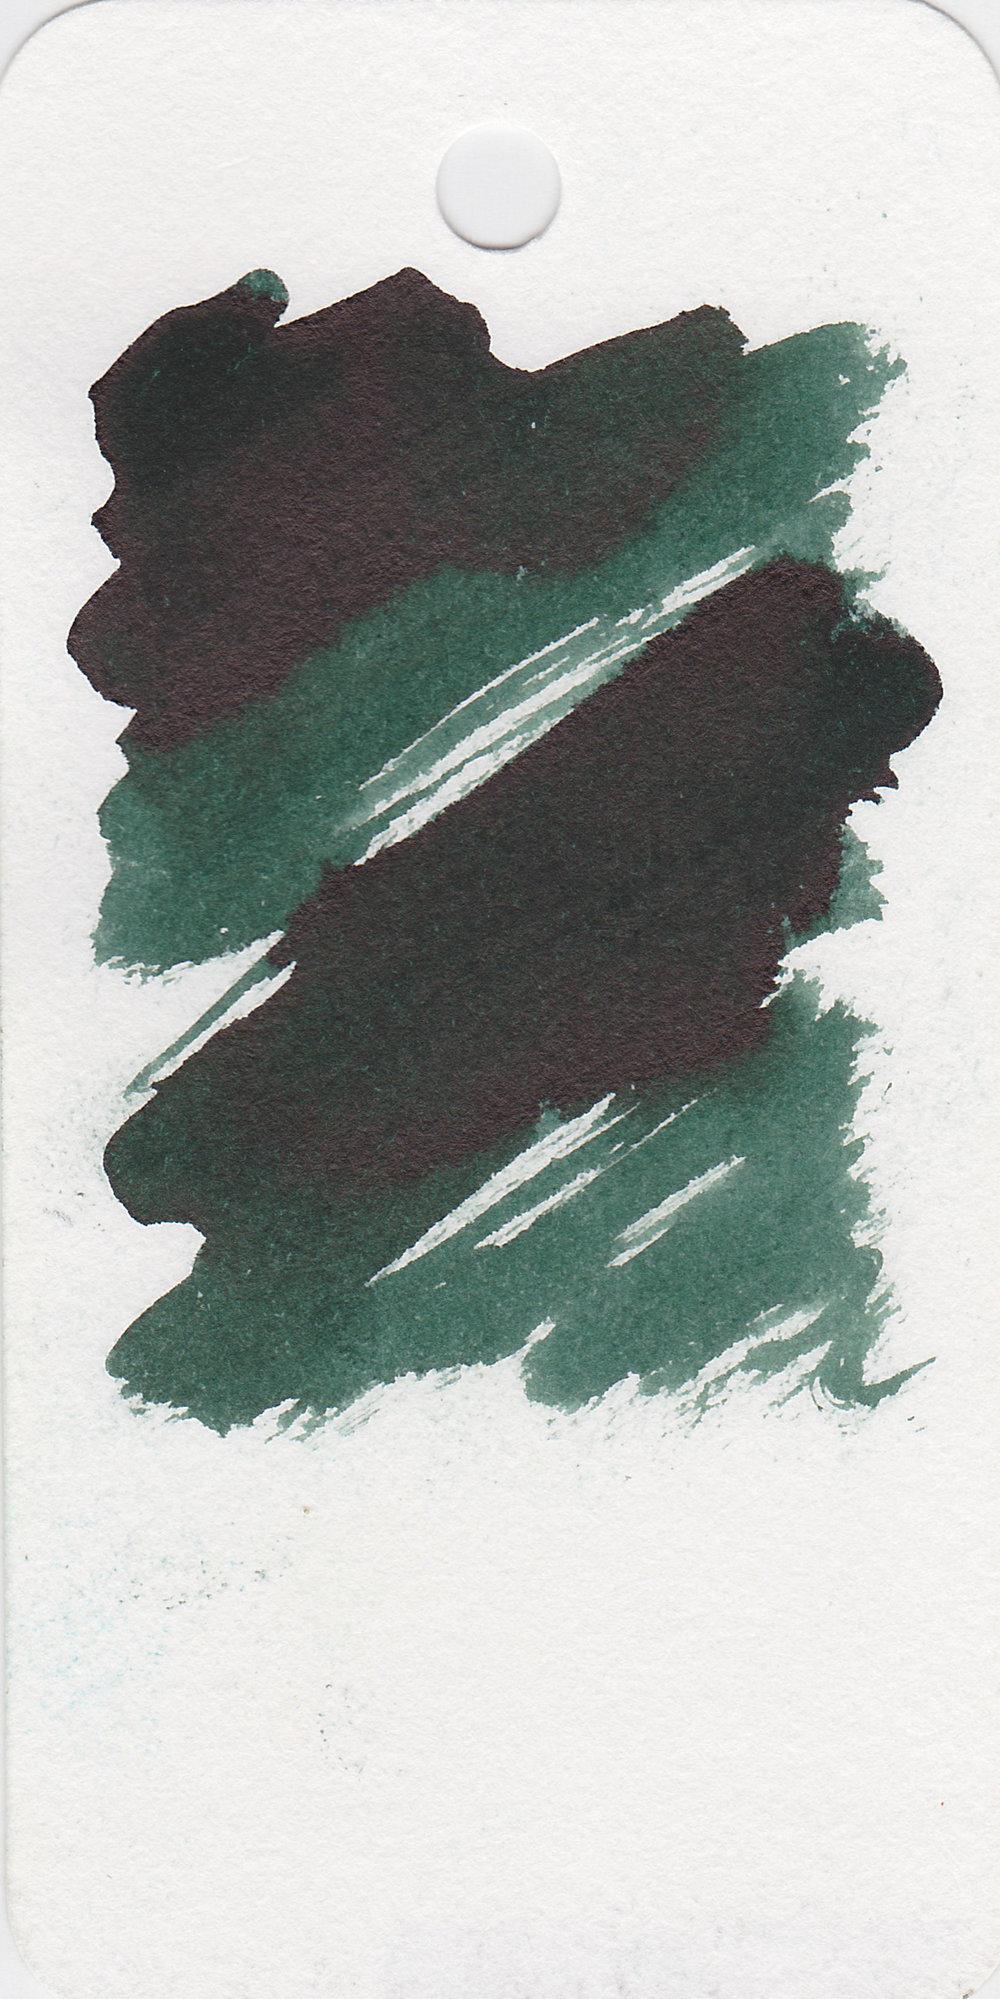 mv-jade-noir-2.jpg